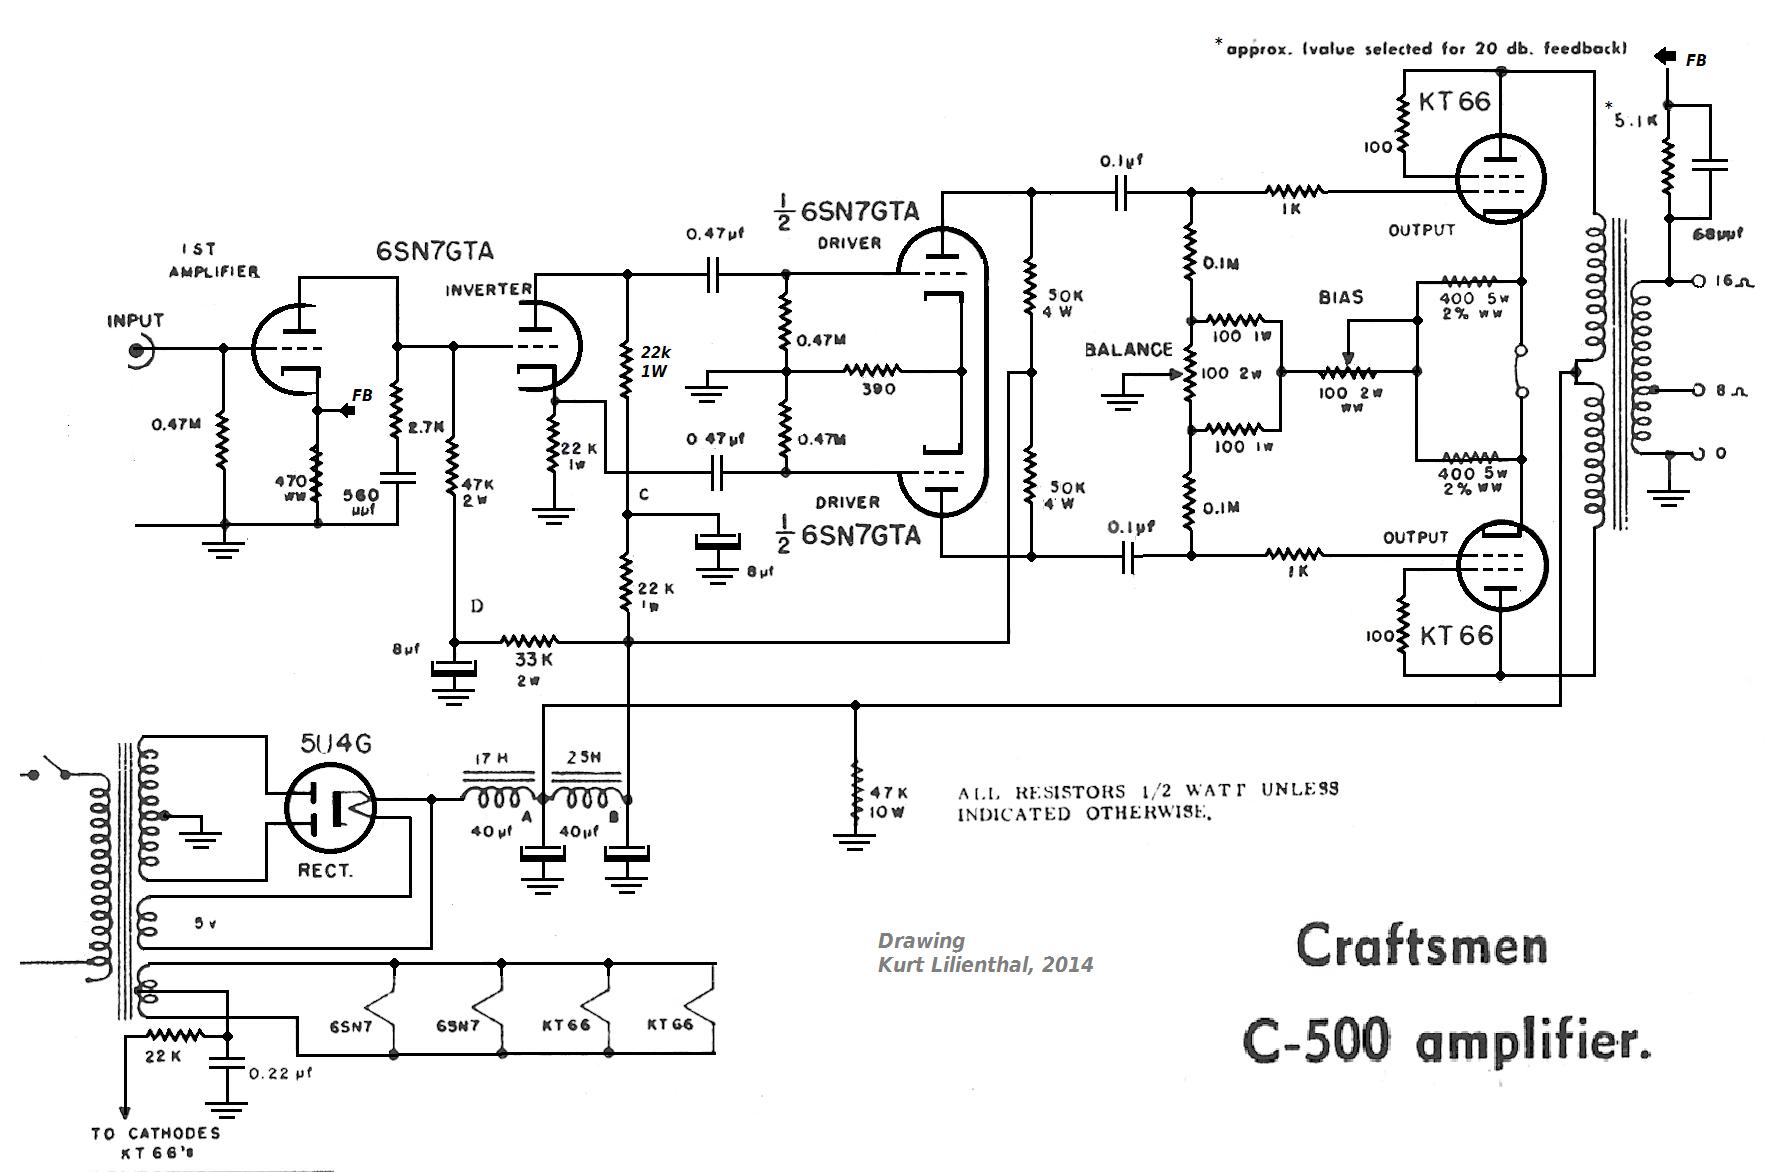 Craftsmen C500, KT66 triode PP, 1954, edt